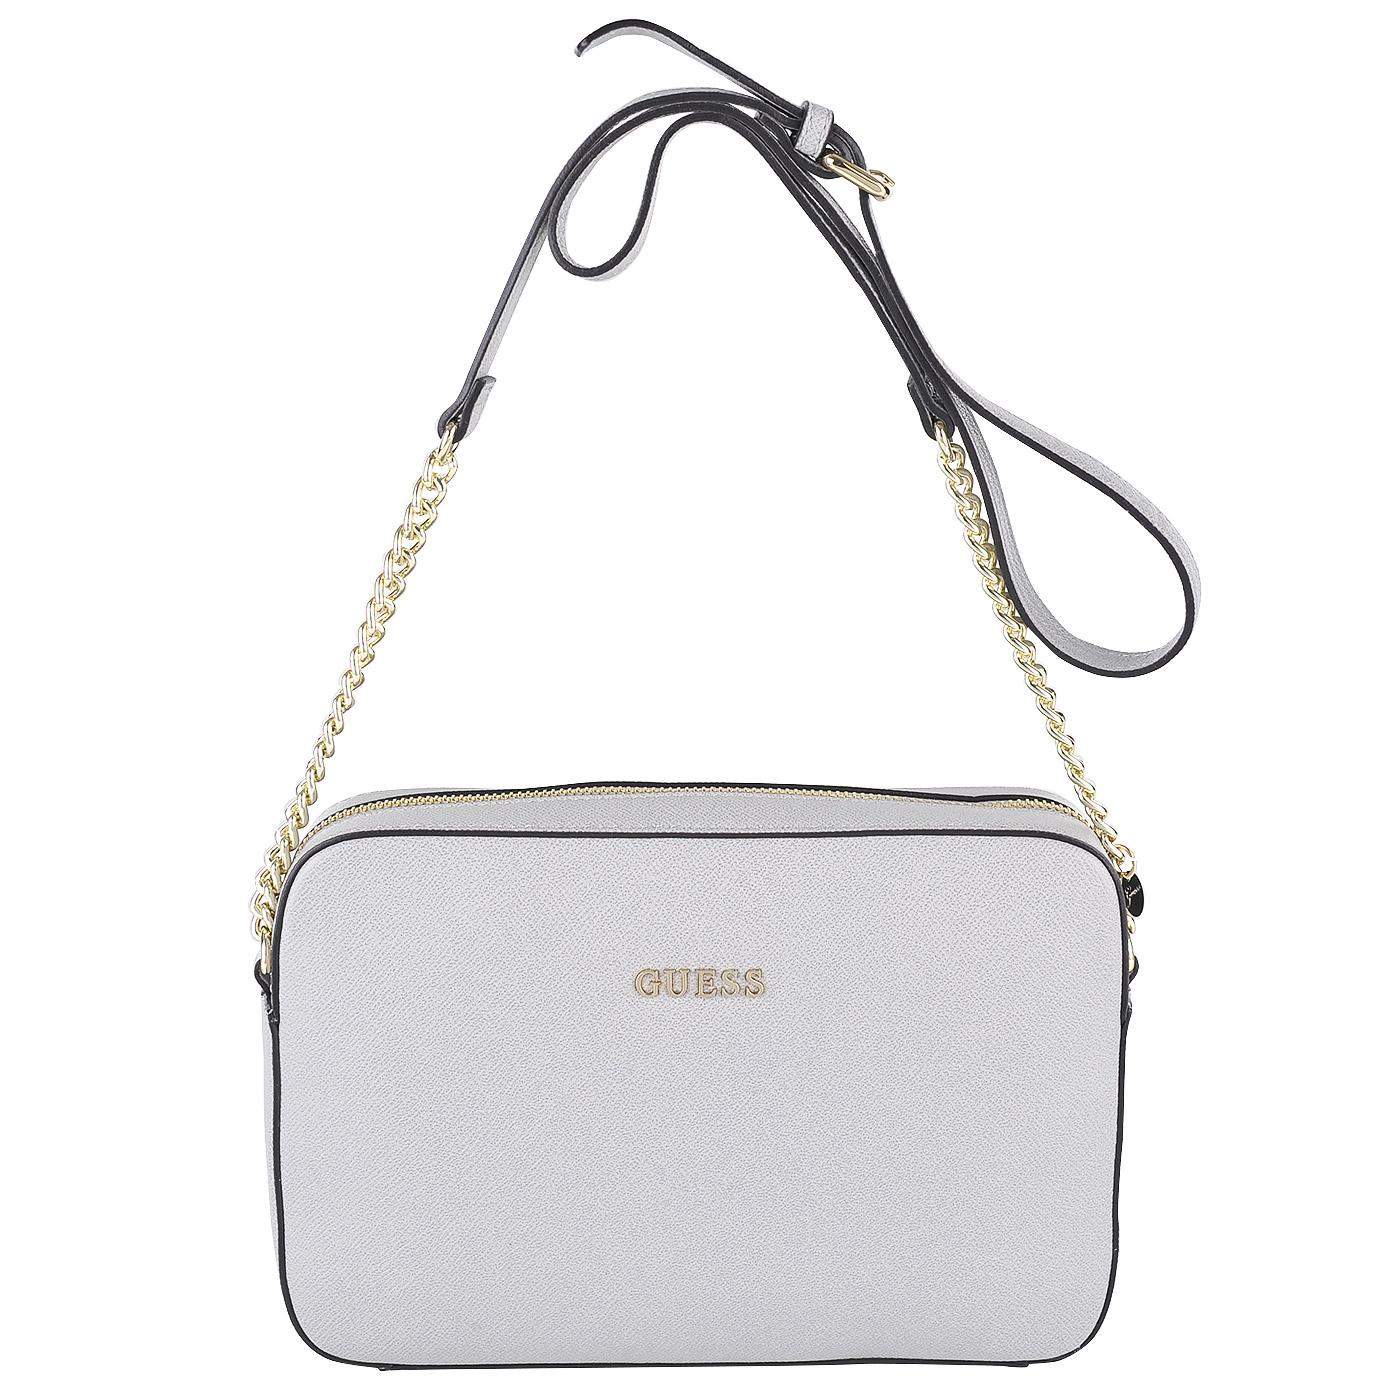 5b316be2 Женская сумка через плечо Guess Isabeau Женская сумка через плечо Guess  Isabeau ...